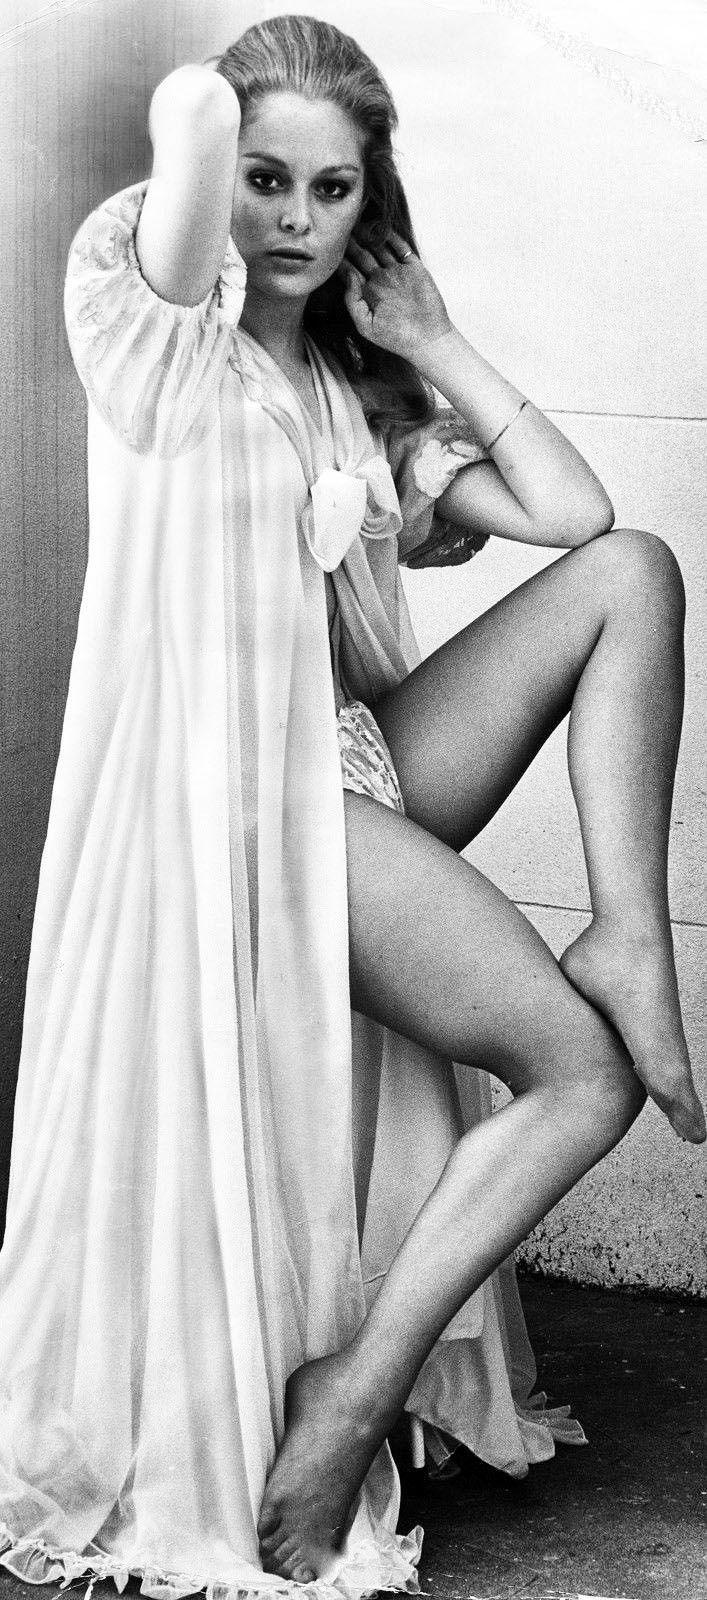 Jenny Hanley nudes (14 photos), Tits, Hot, Feet, butt 2006